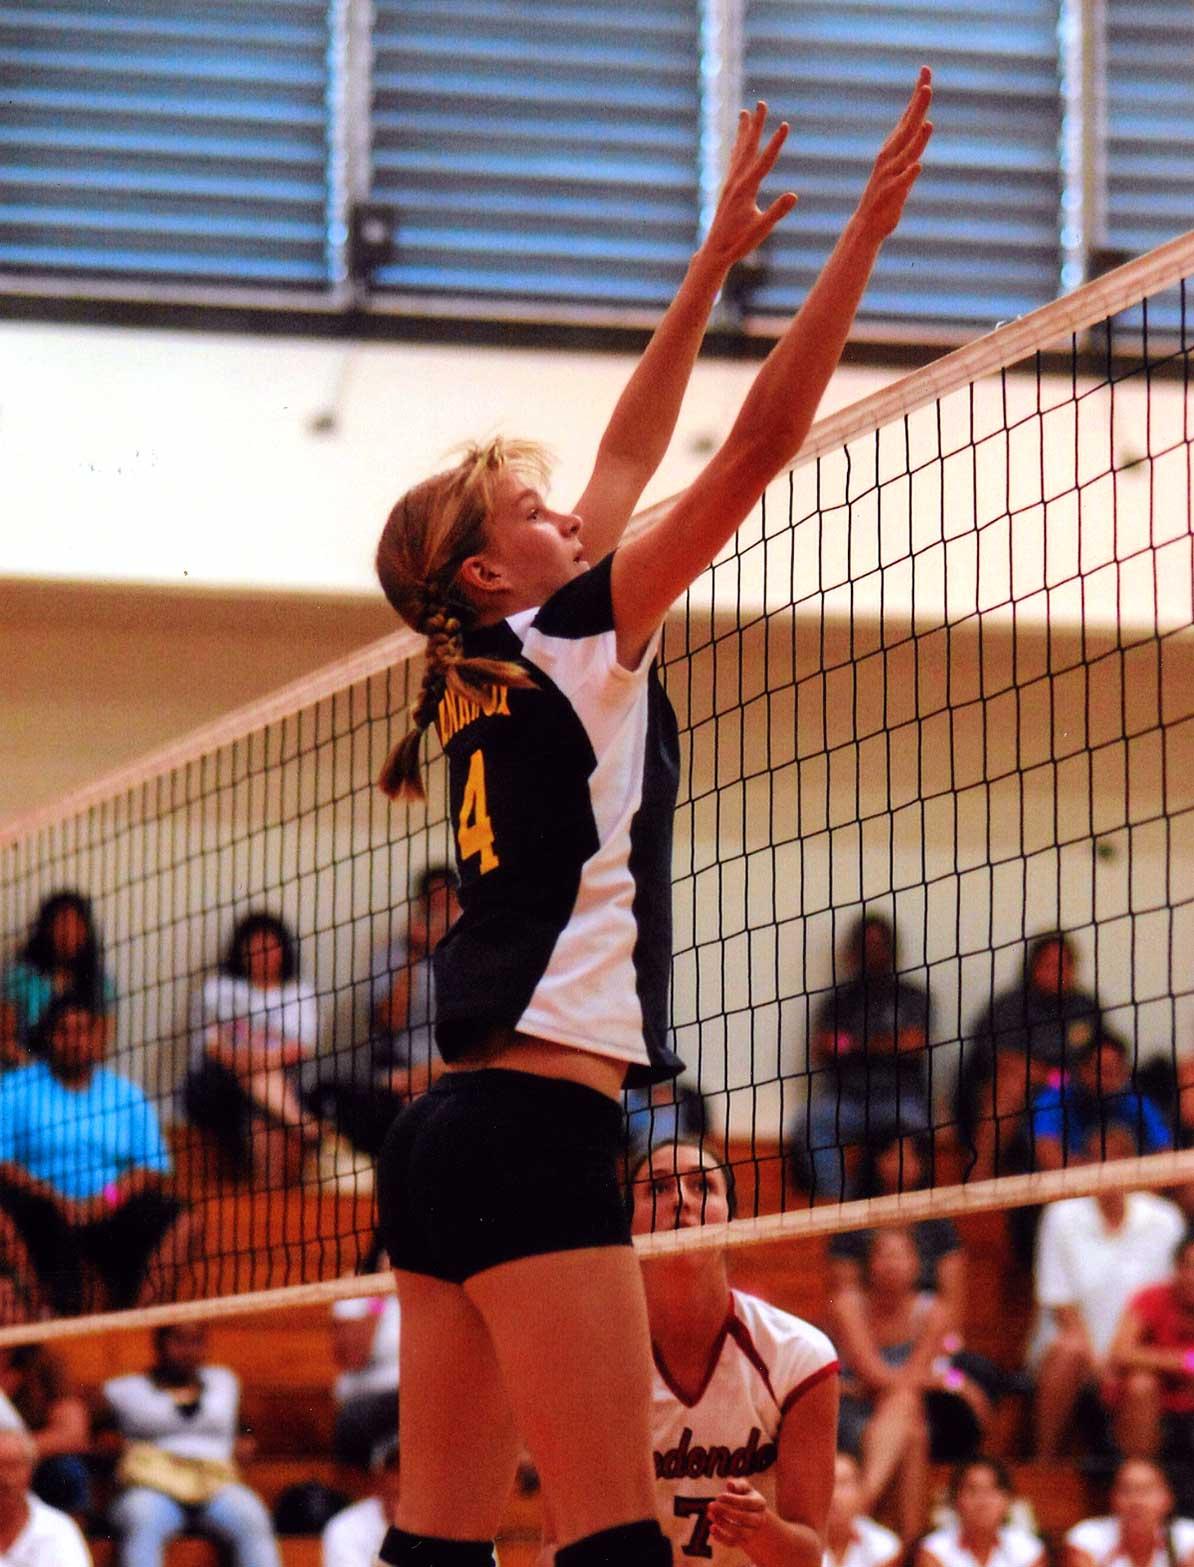 Juliana Behrens Volleyball